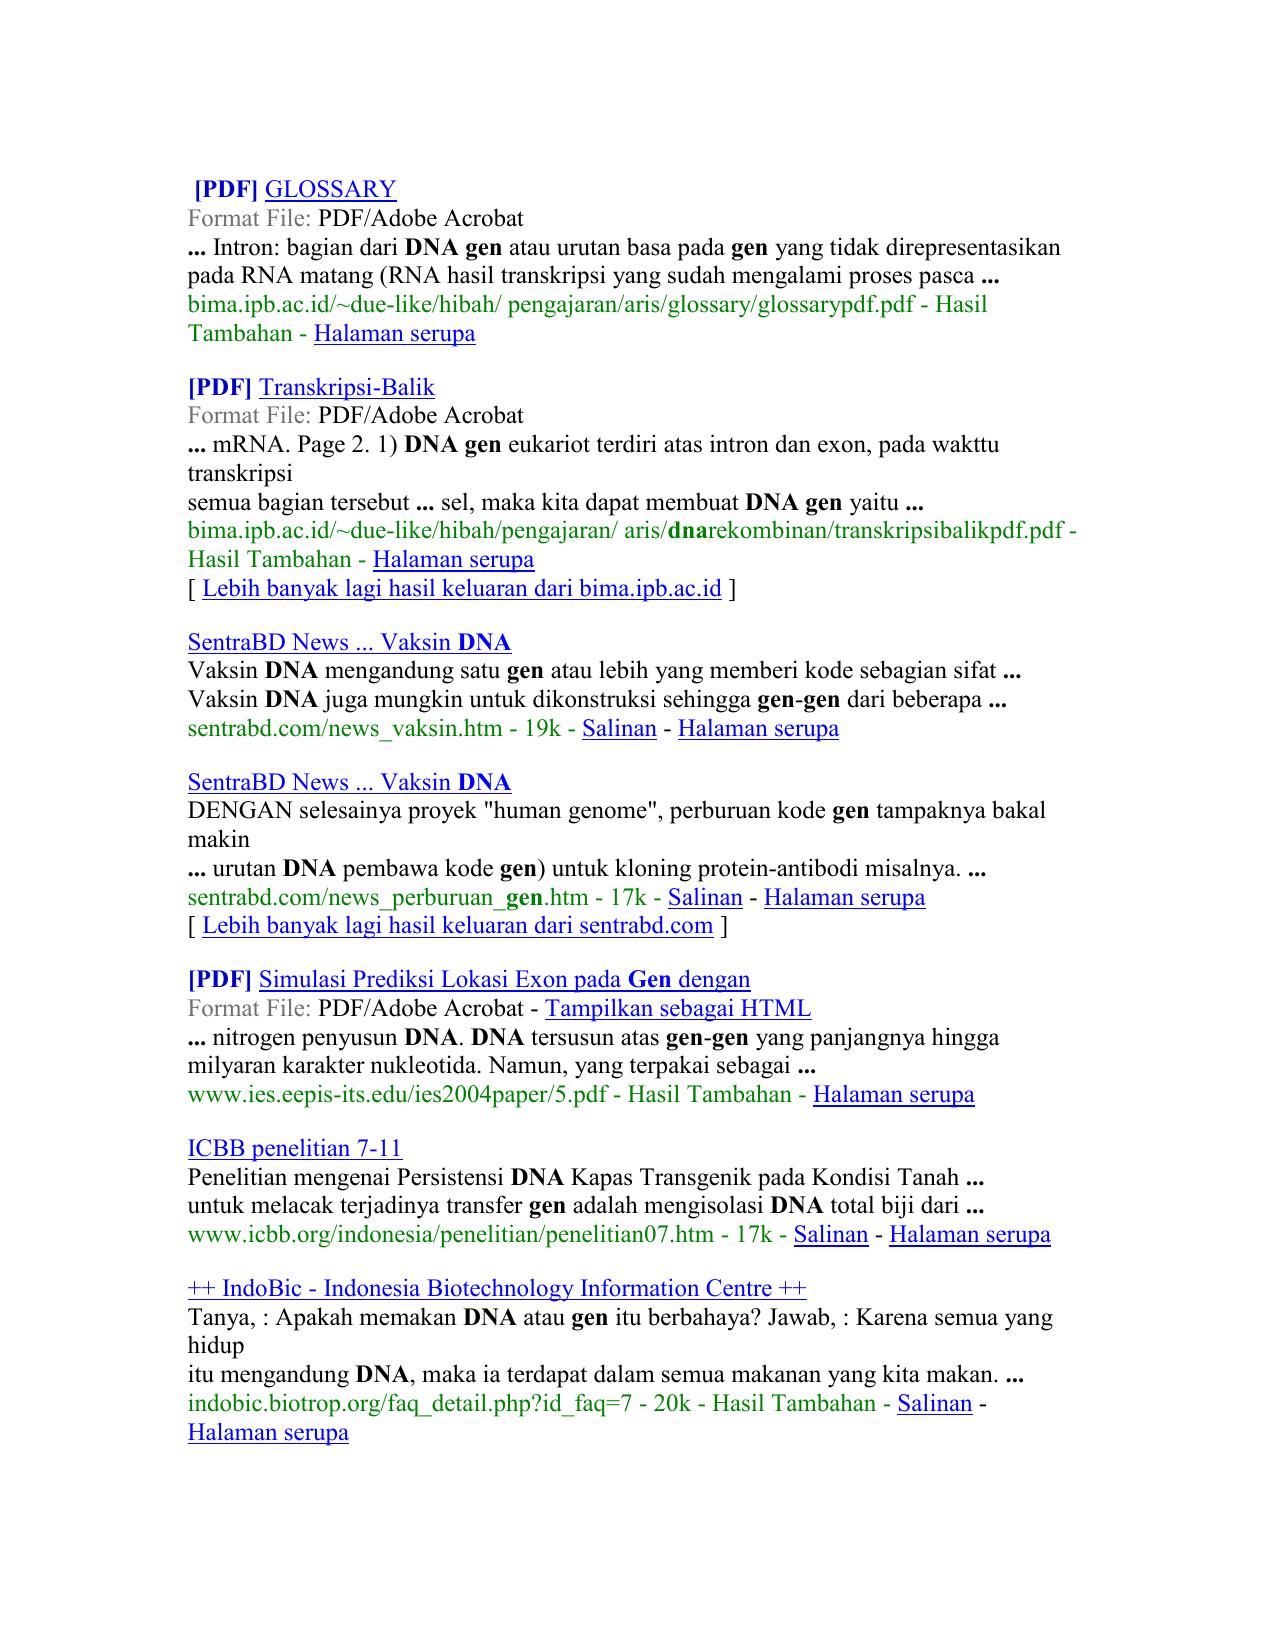 b6f2c15e5 [PDF] GLOSSARY Format File: PDF/Adobe Acrobat Intron: bagian